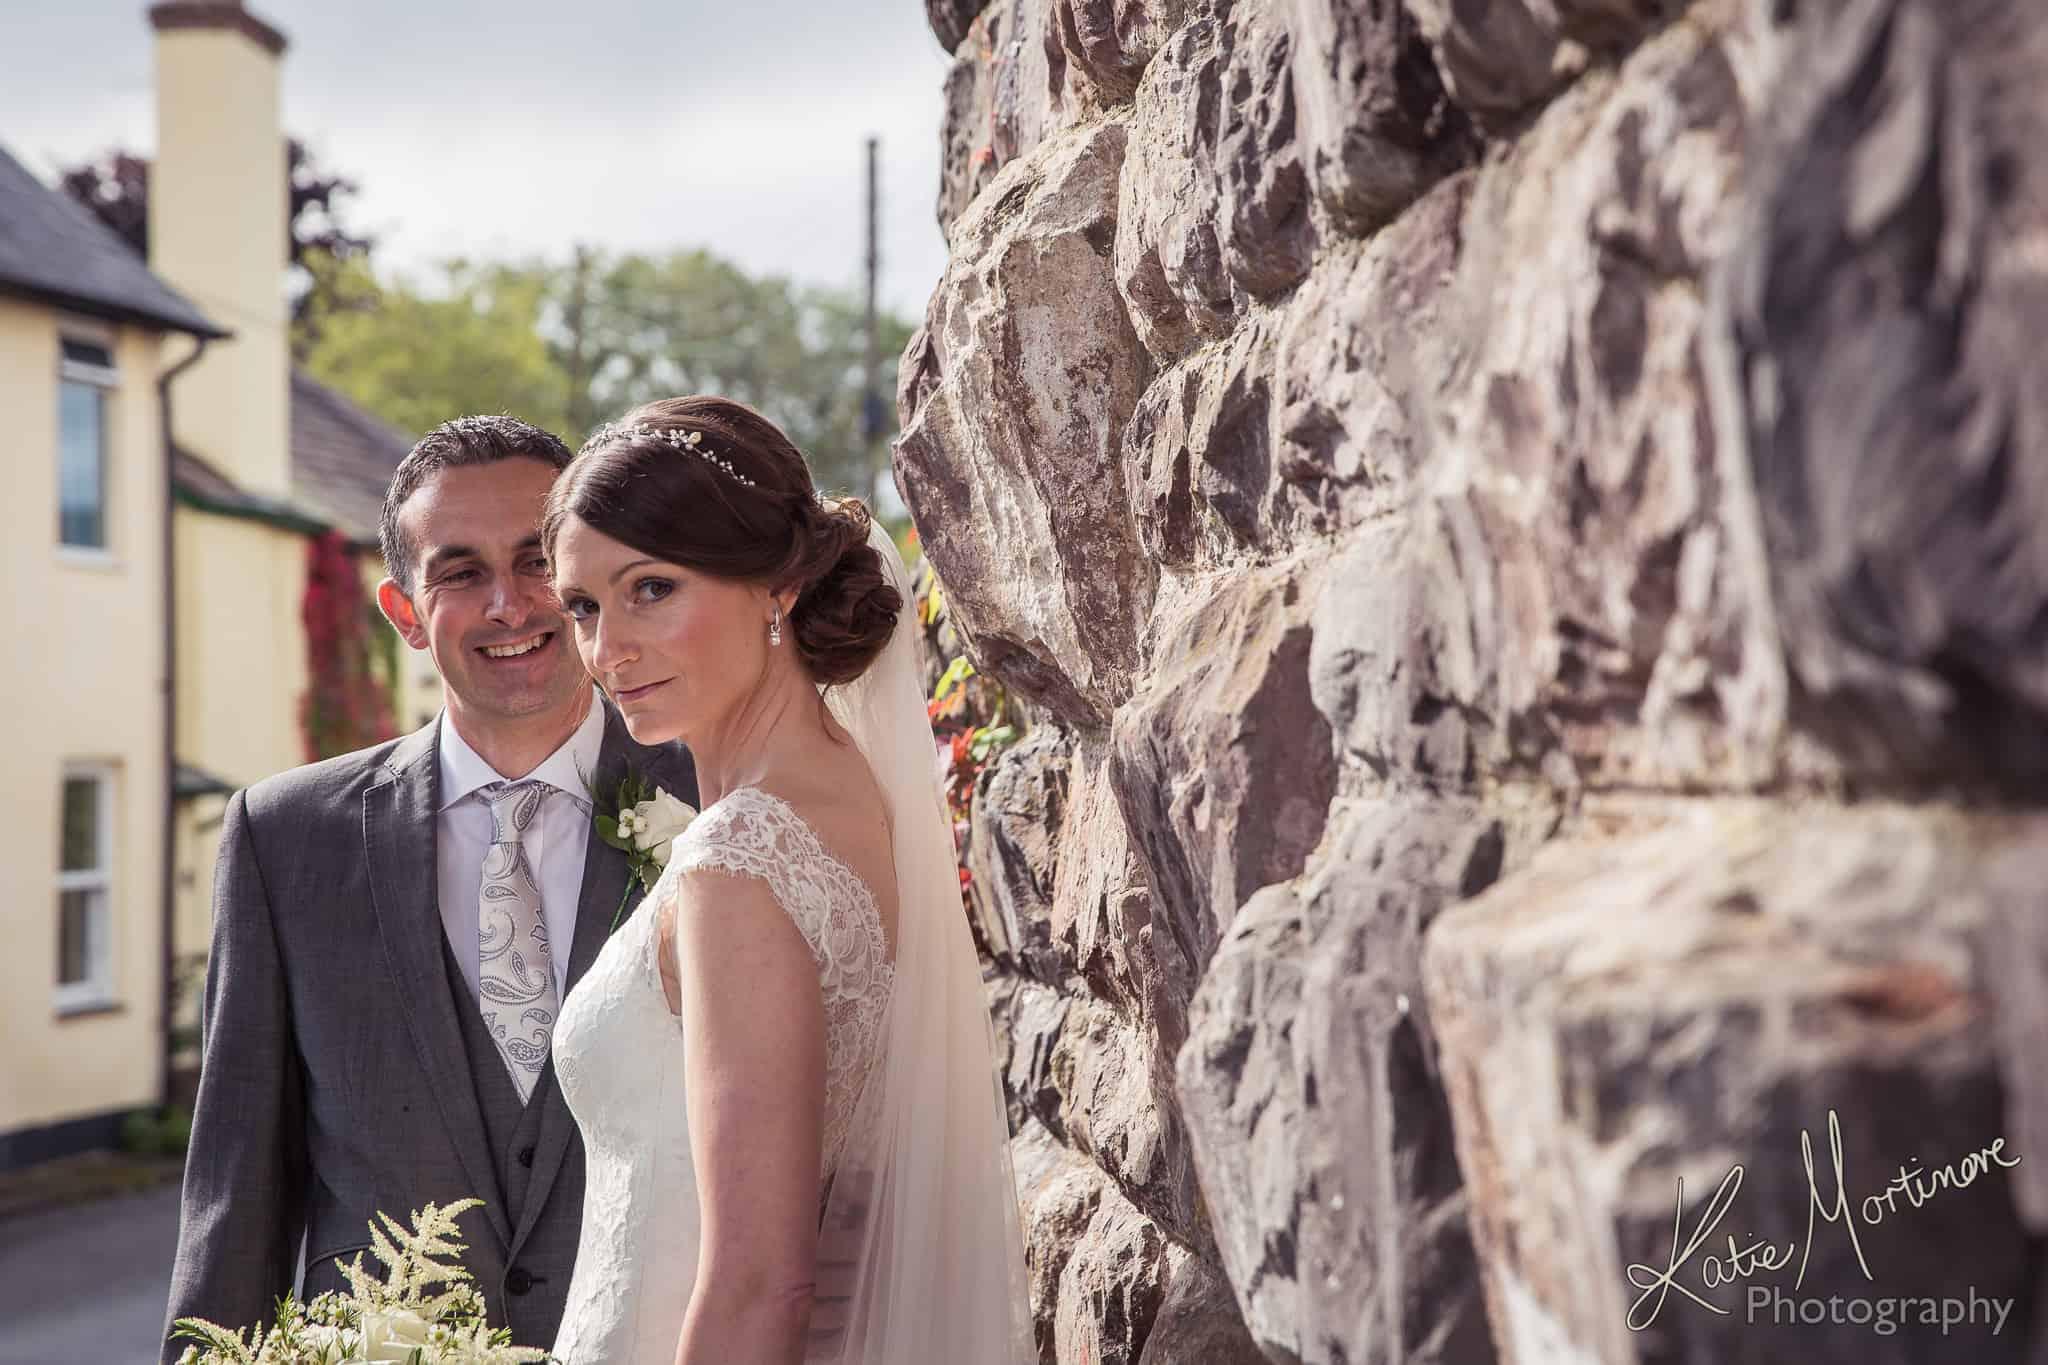 hartnoll hotel tiverton wedding photographer devon